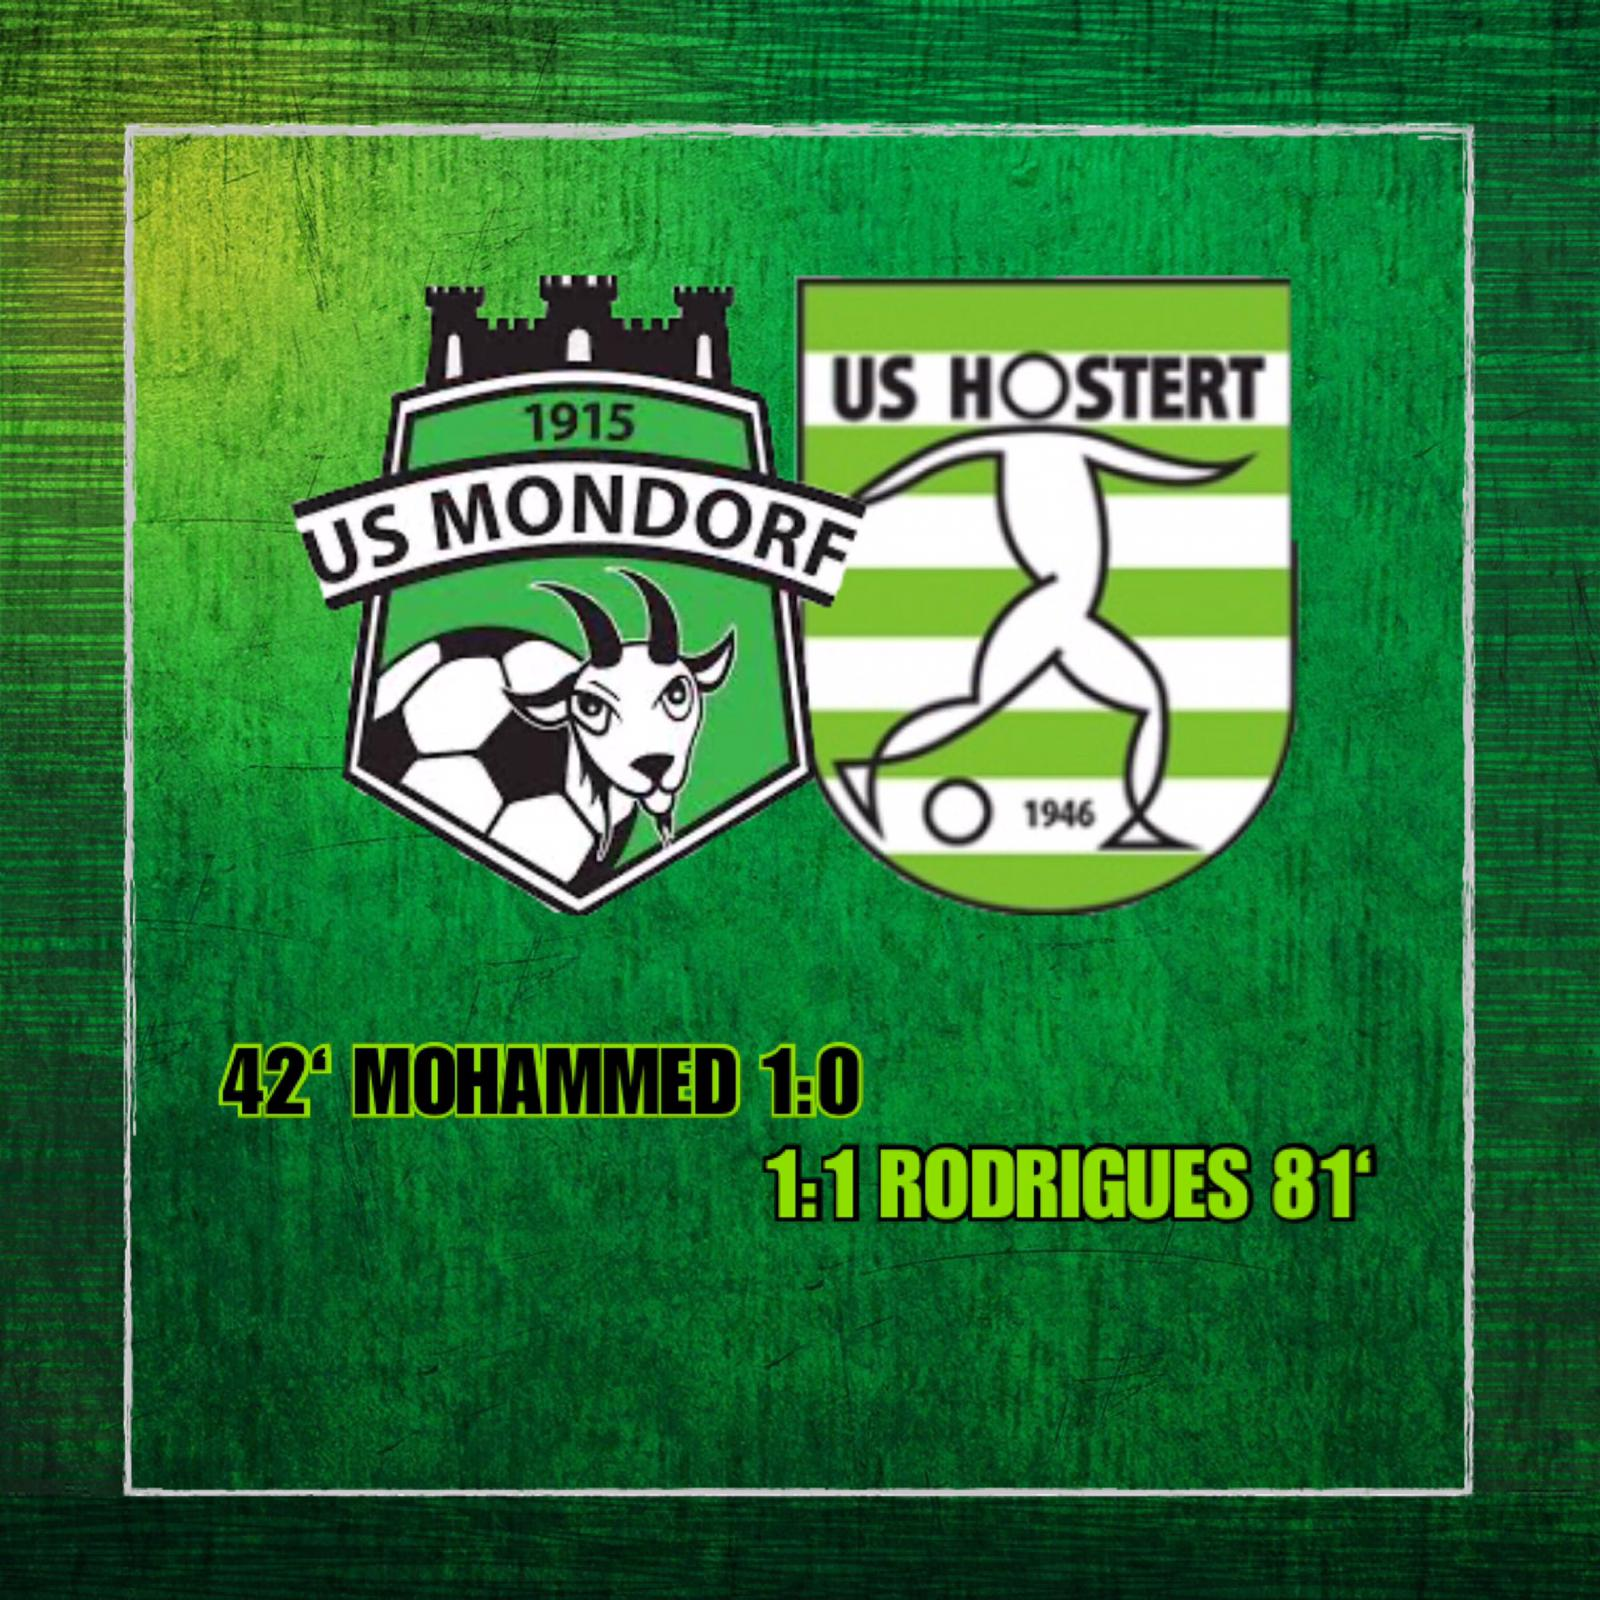 US MONDORF - US HOSTERT. 1 - 1 (1-0)